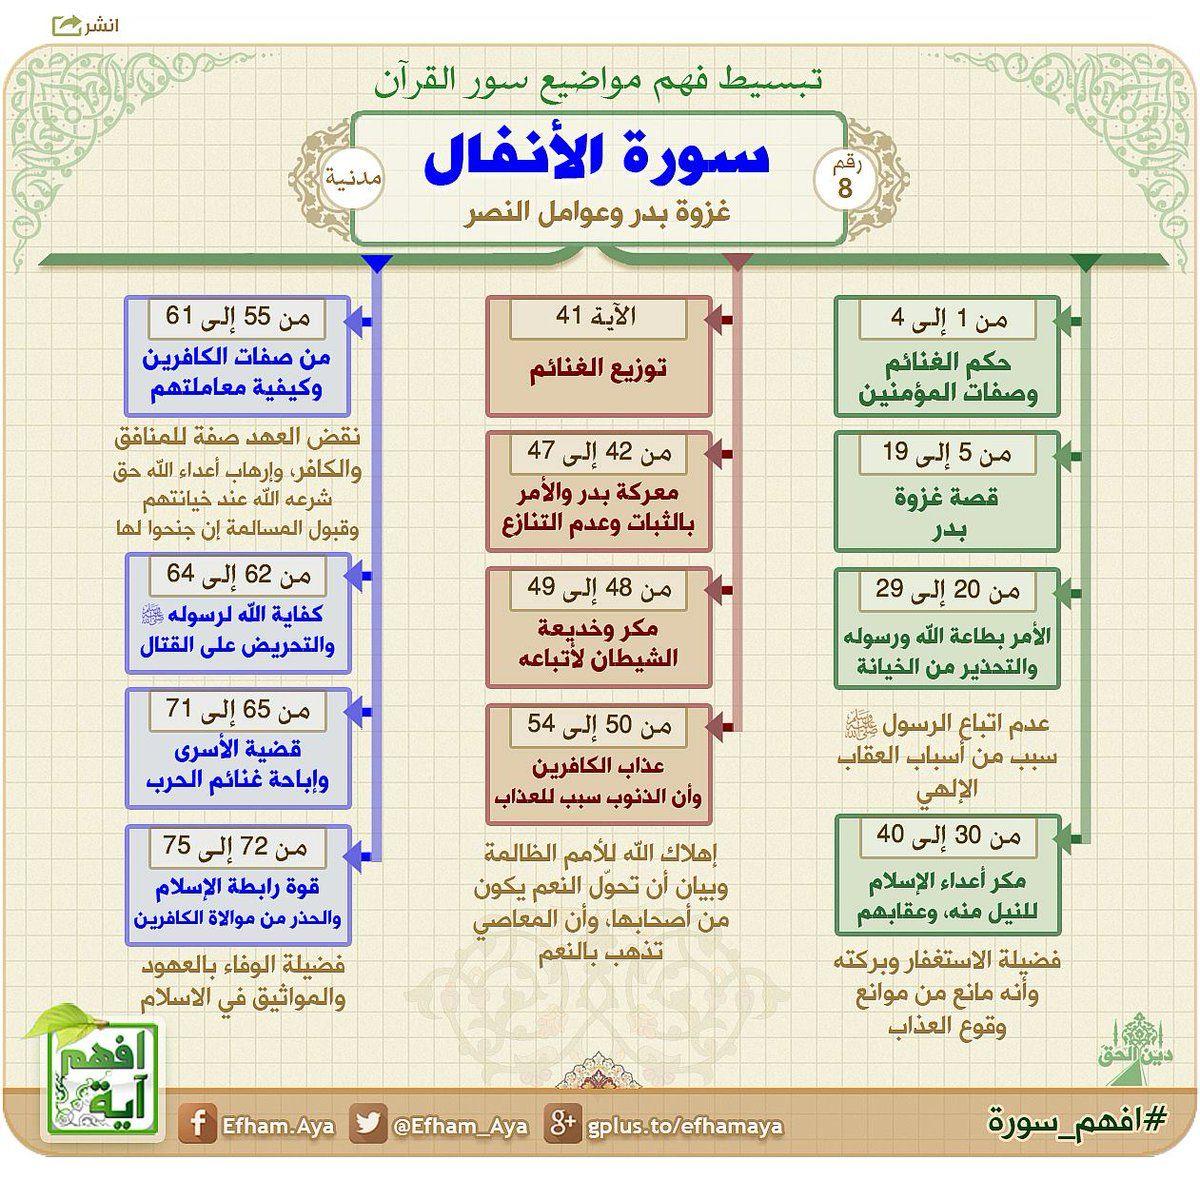 Pin By Thekingisgid On خرائط ذهنية لسور القرآن Quran Recitation Learn Quran Islamic Quotes Quran